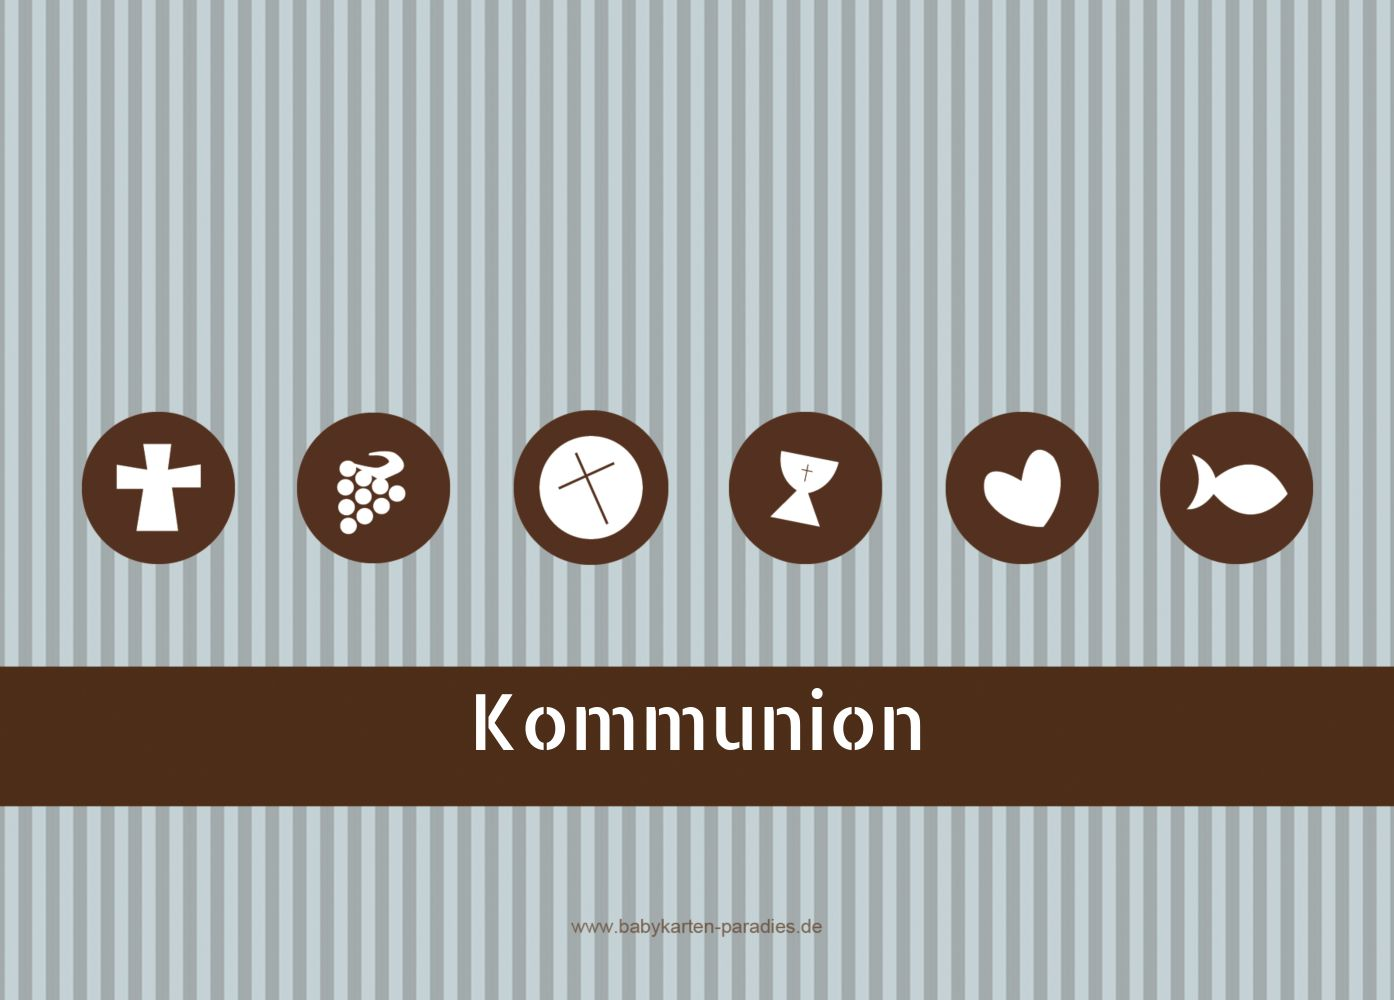 Ansicht 2 - Kommunionskarte Stripes-Buttons